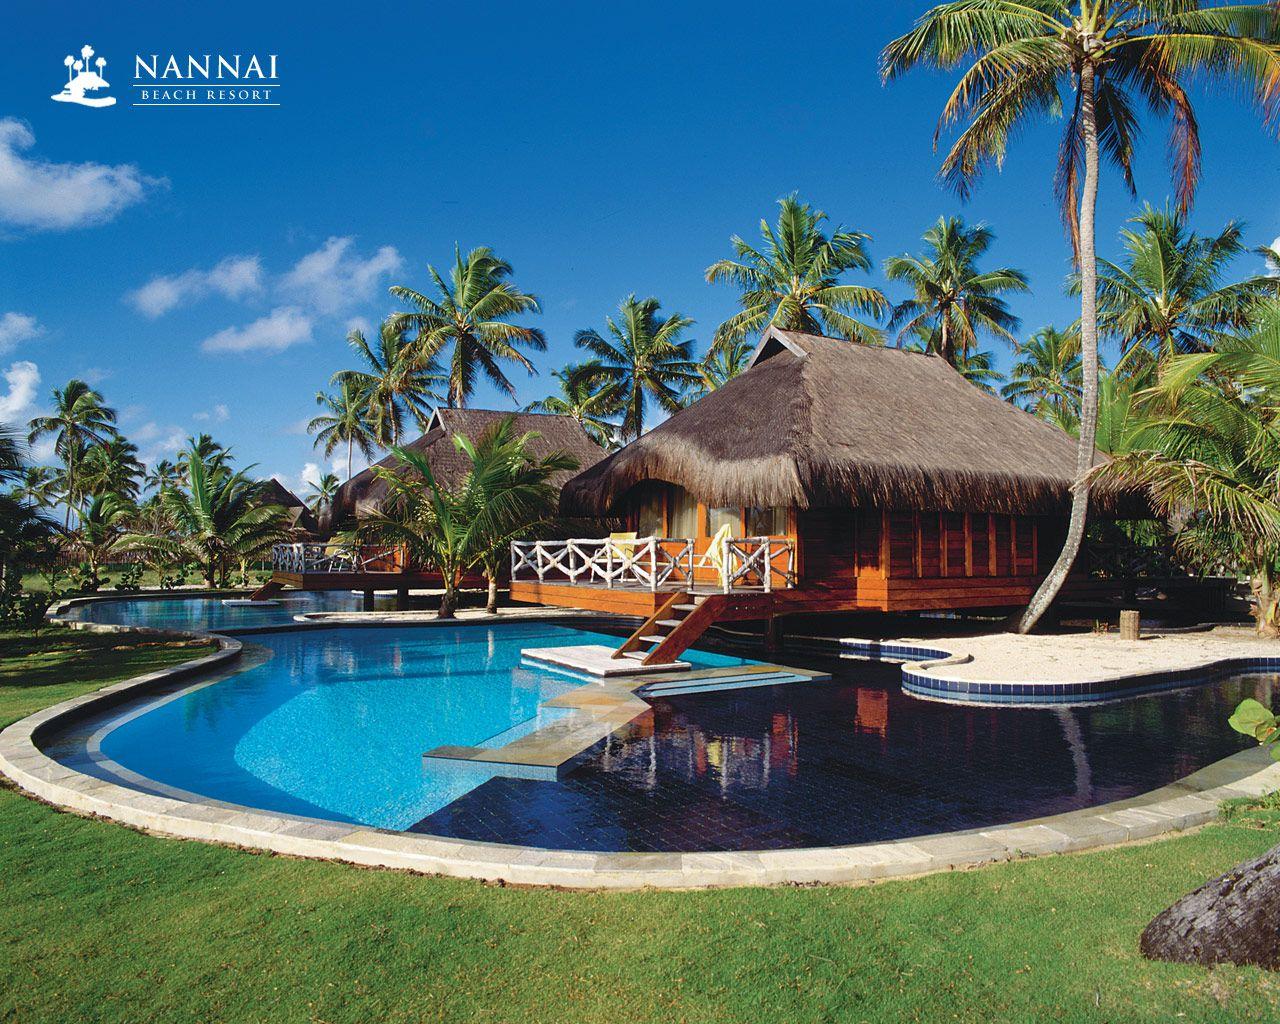 Nannai Beach Resort Muro Alto Pernambuco Brasil Page Www